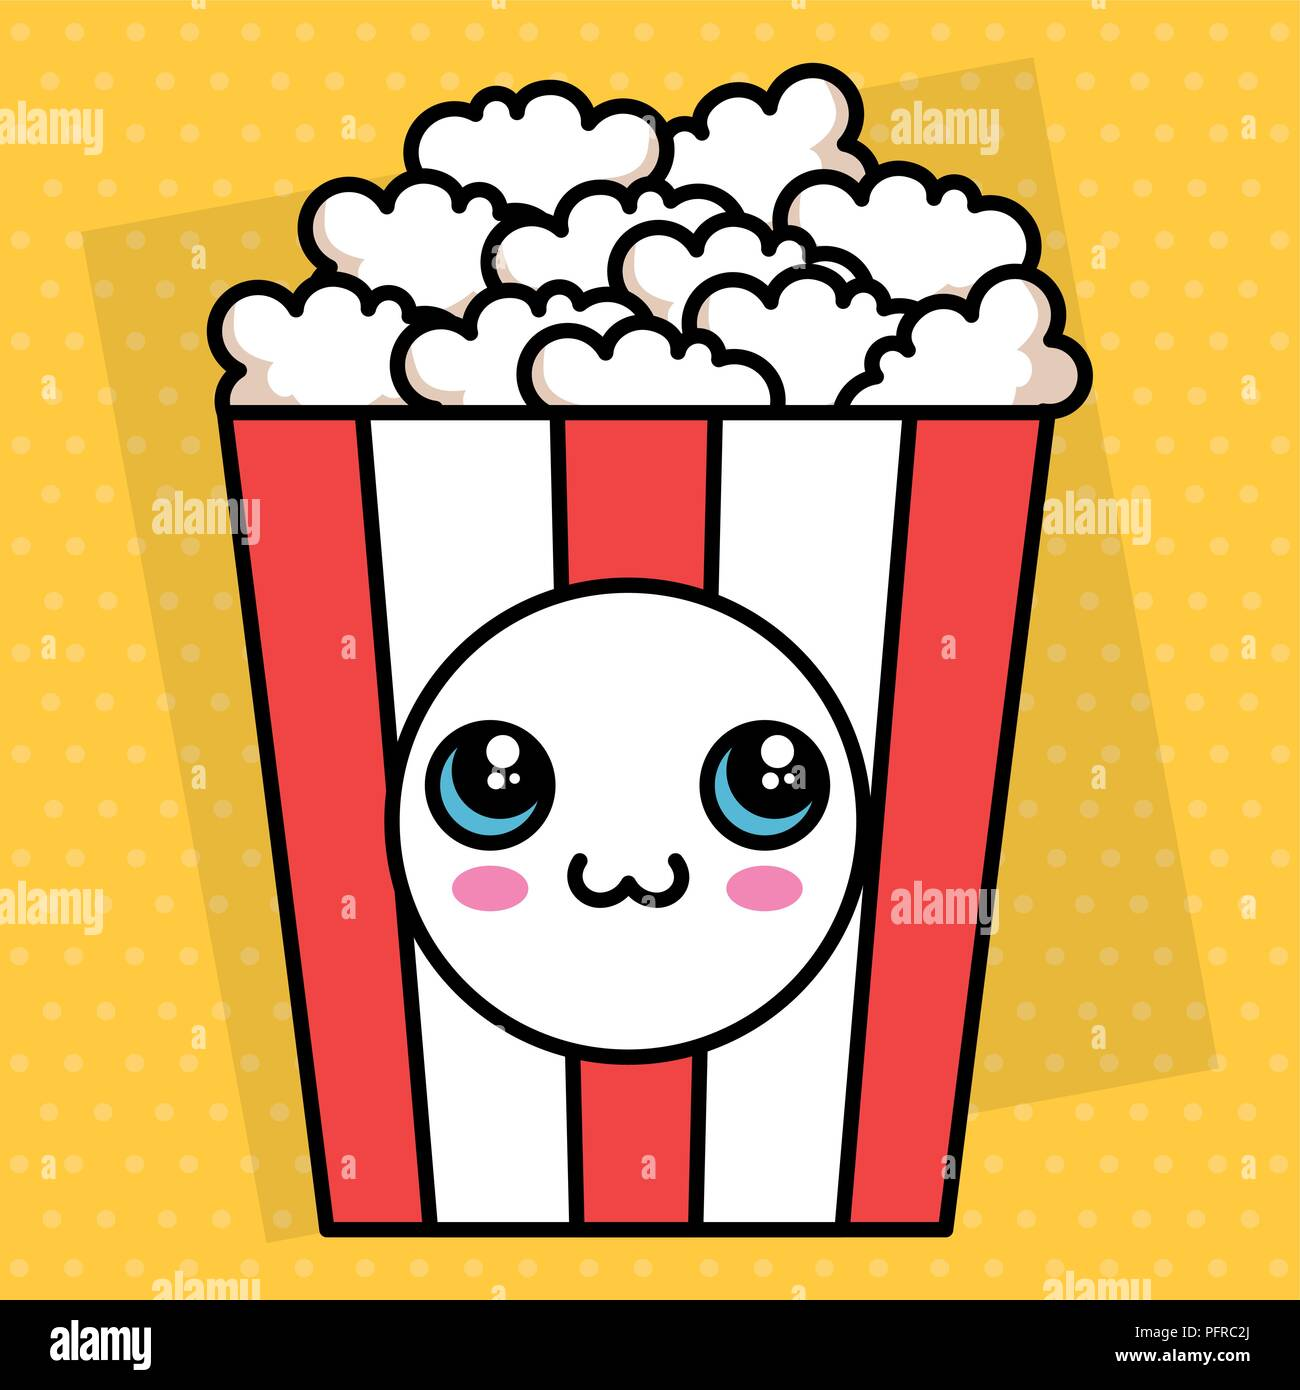 Pop Corn Kawaii Character Stock Vector Art Illustration